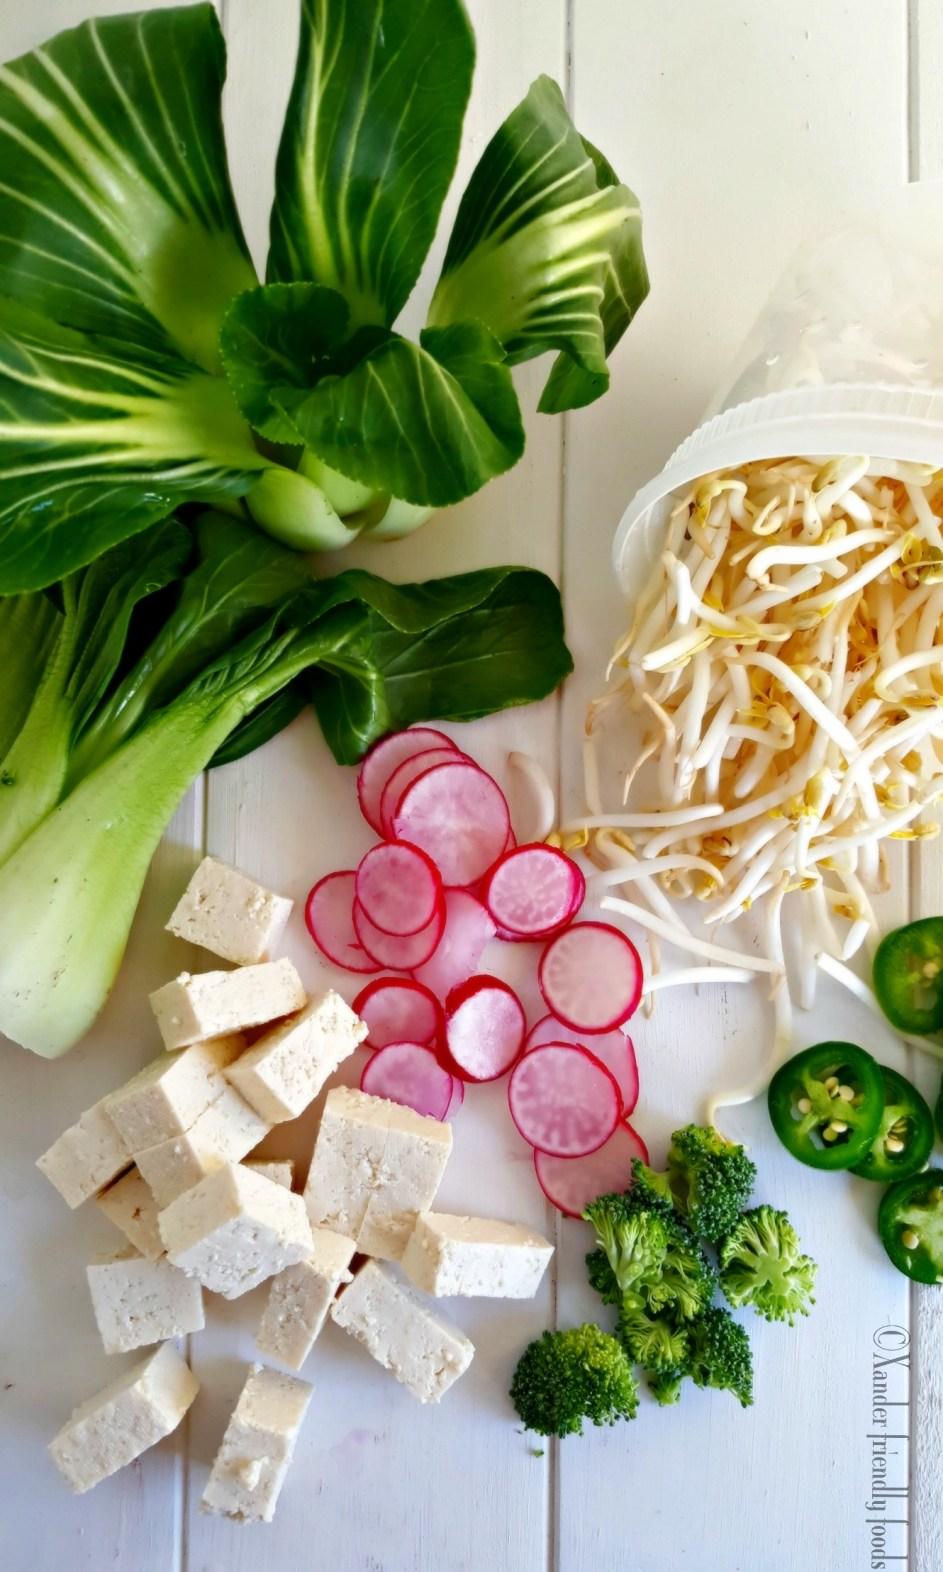 Soup Bowl Ingredients